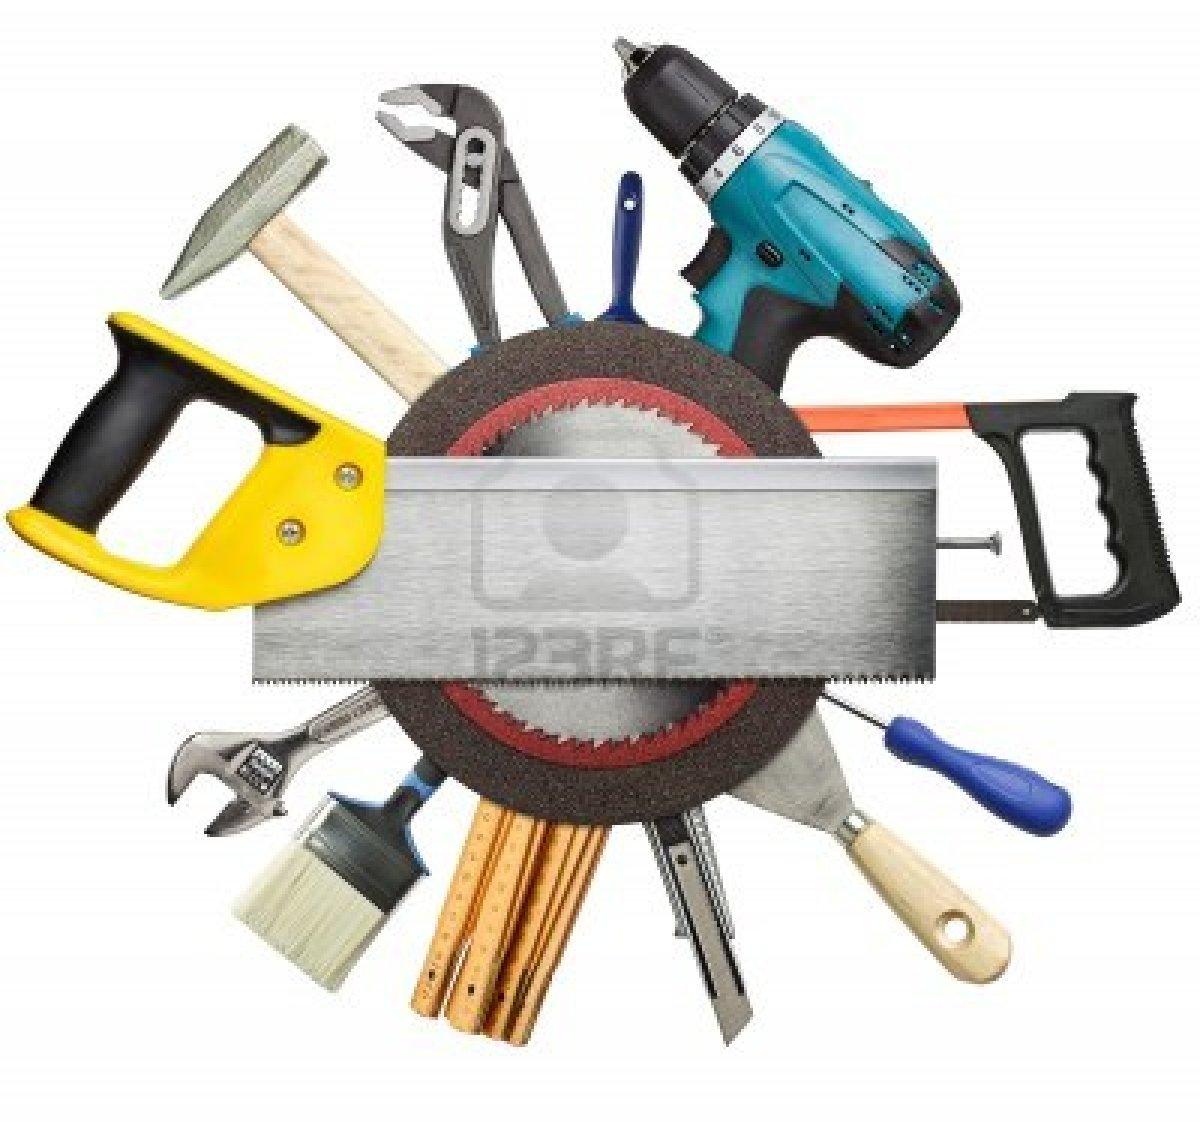 Carpentry Tools - Carpentry Tools Basic Information